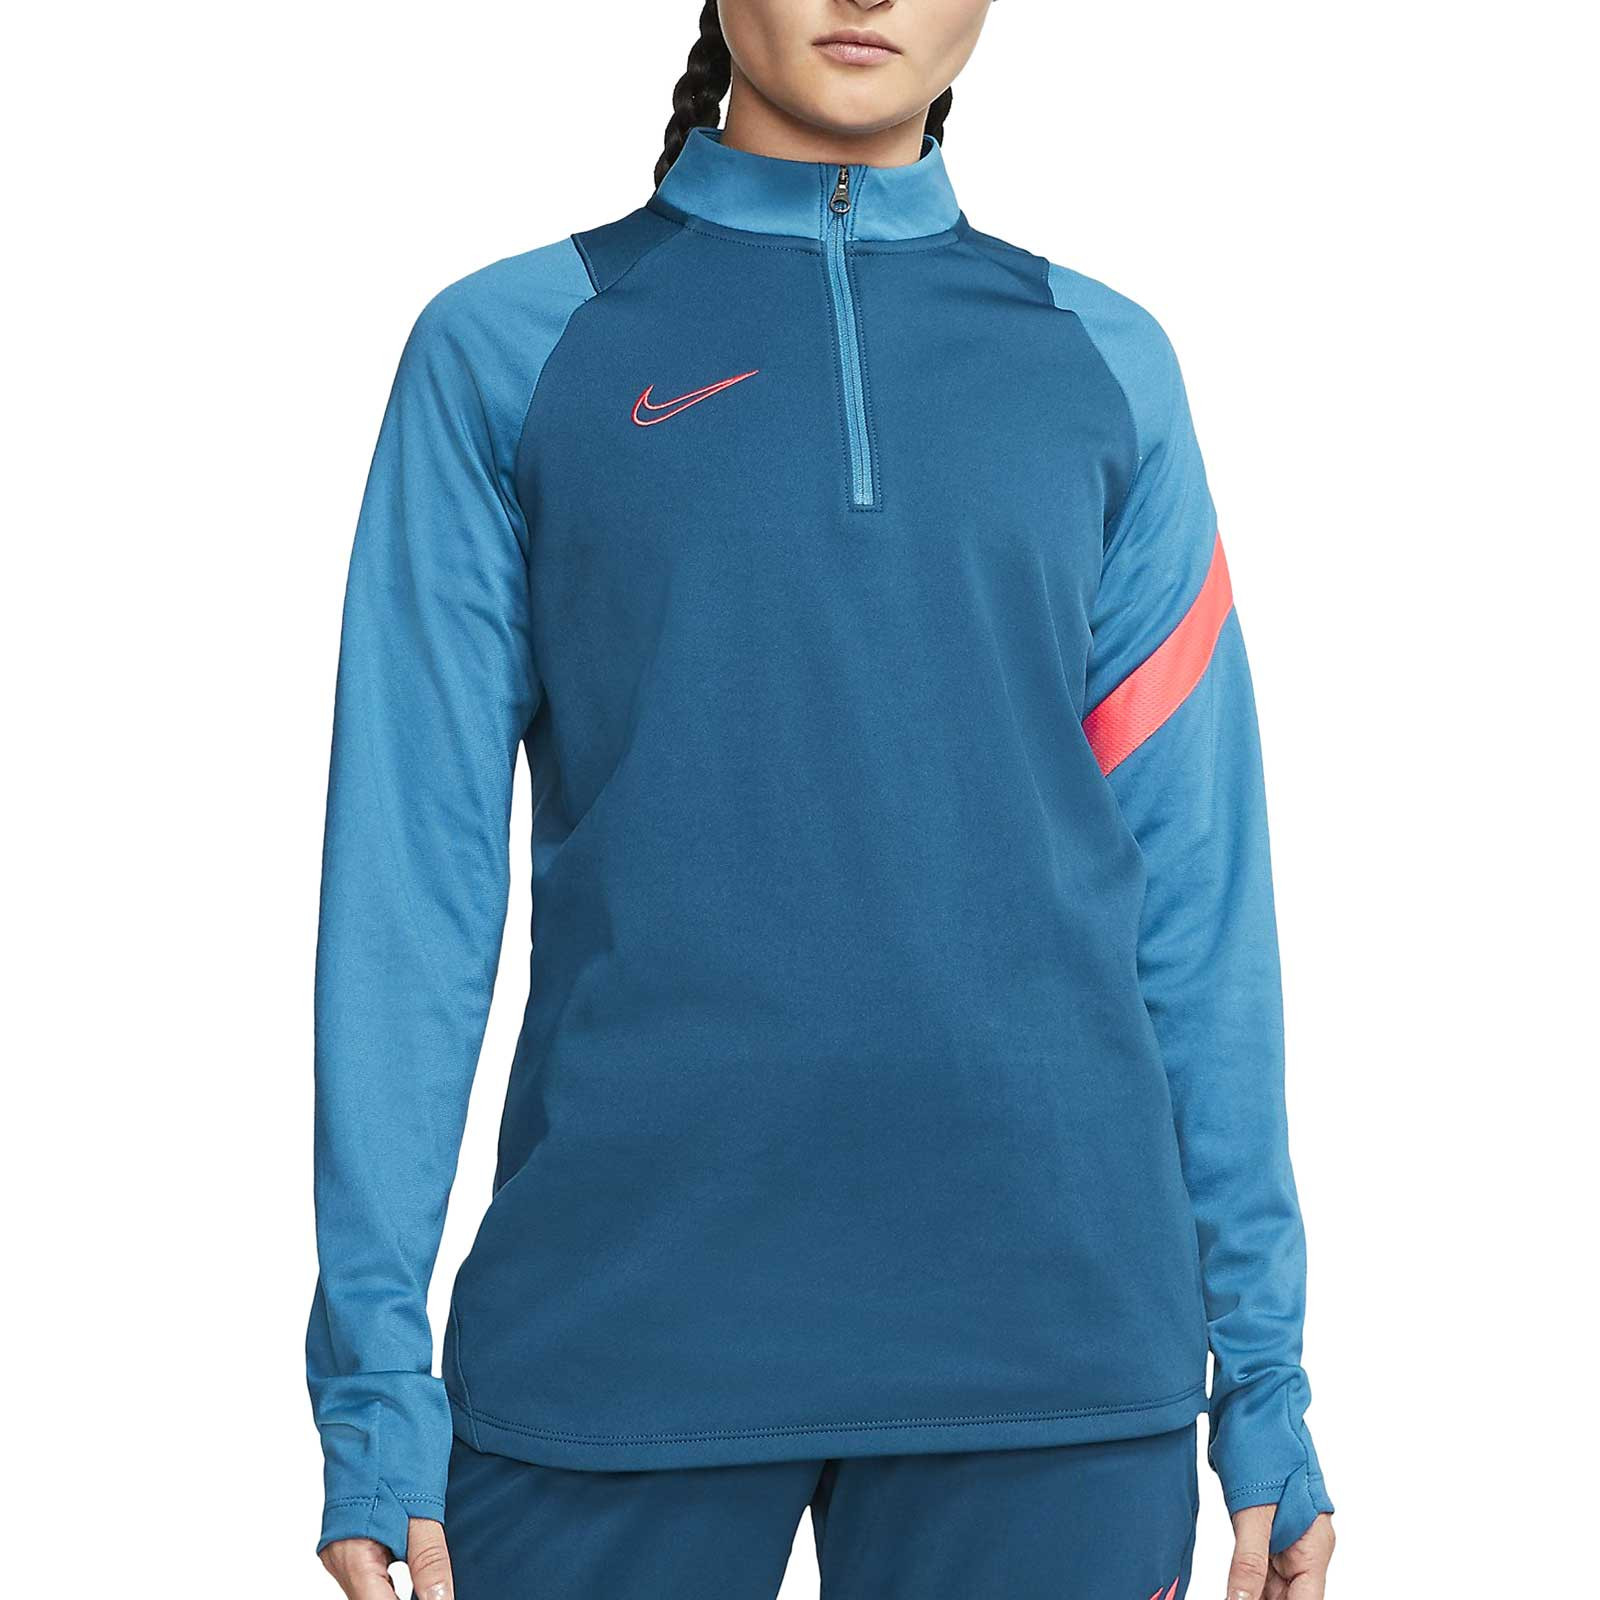 Nylon Leer Patriótico  Sudadera Nike mujer Dry Academy Pro azul | futbolmania